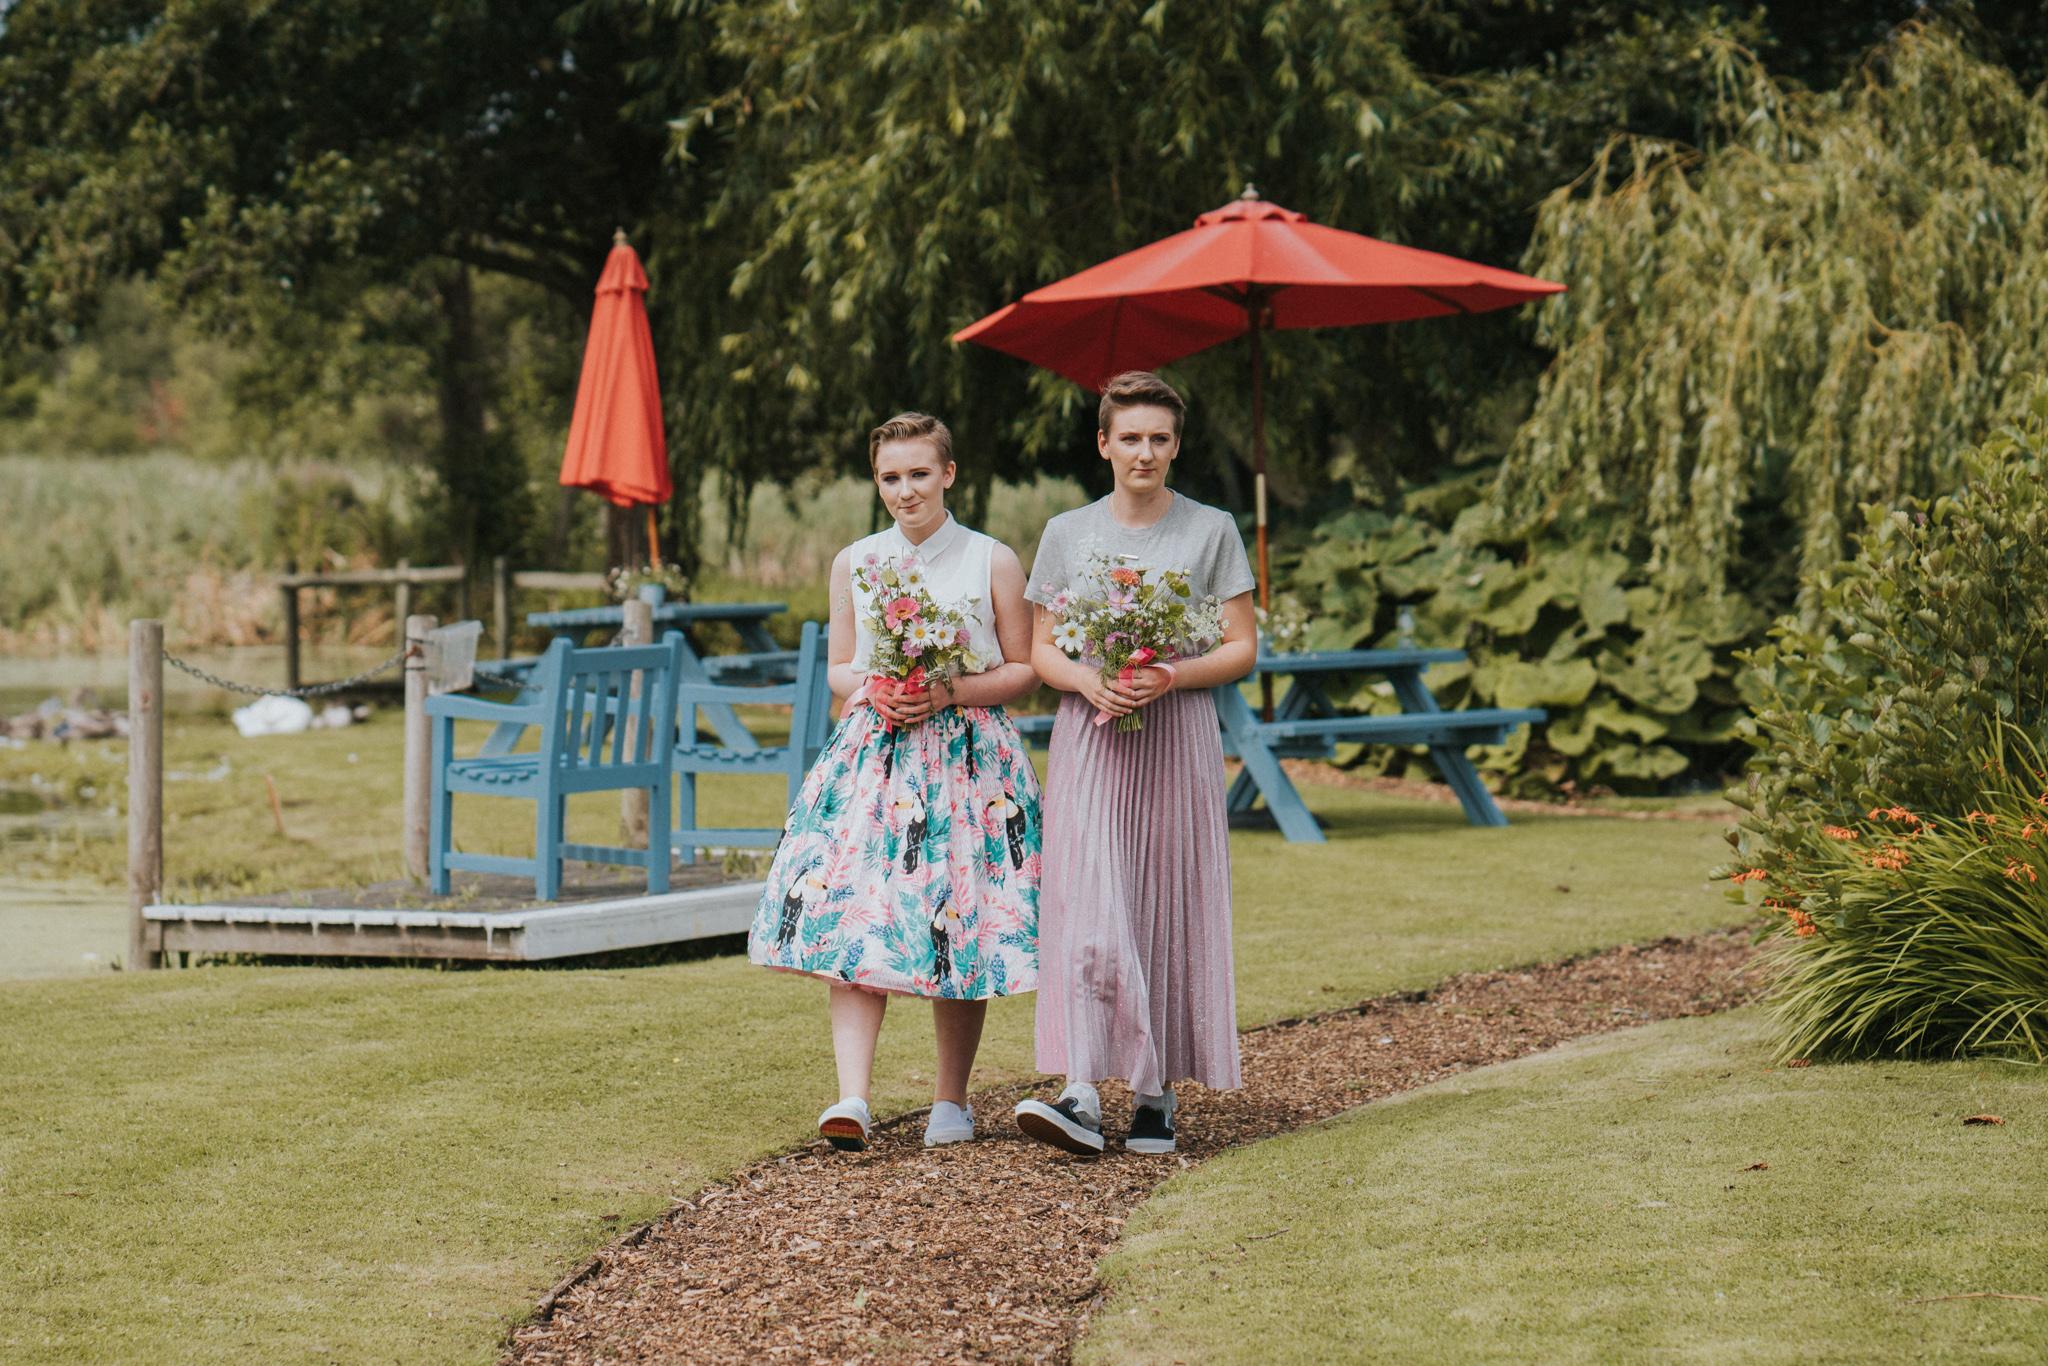 hannah-anthony-thorpeness-retro-diy-50s-wedding-grace-elizabeth-colchester-essex-alternative-wedding-lifestyle-photographer-essex-suffolk-norfolk-devon (7 of 39).jpg